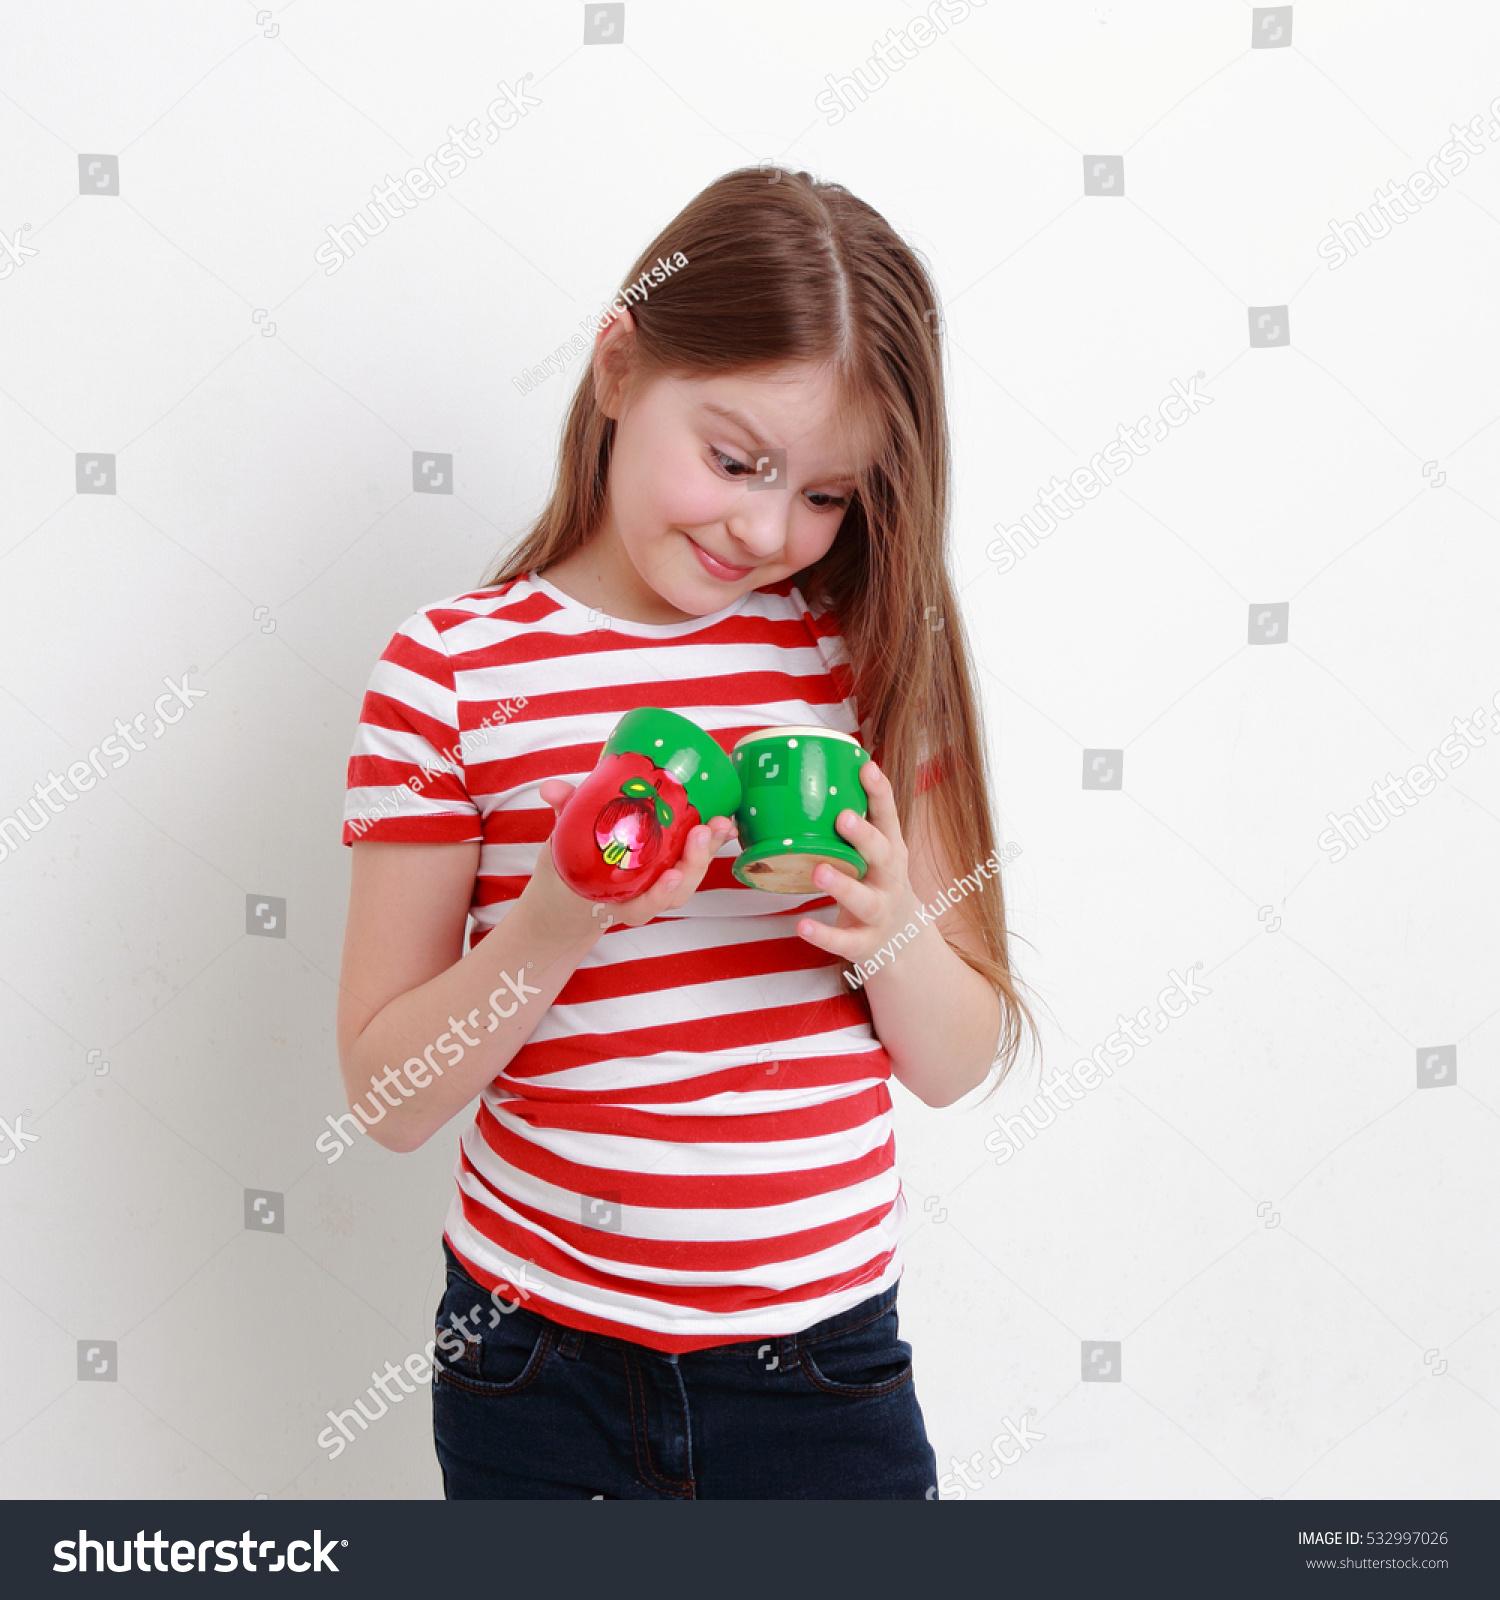 Beautiful russian teen girl holding matryoshka